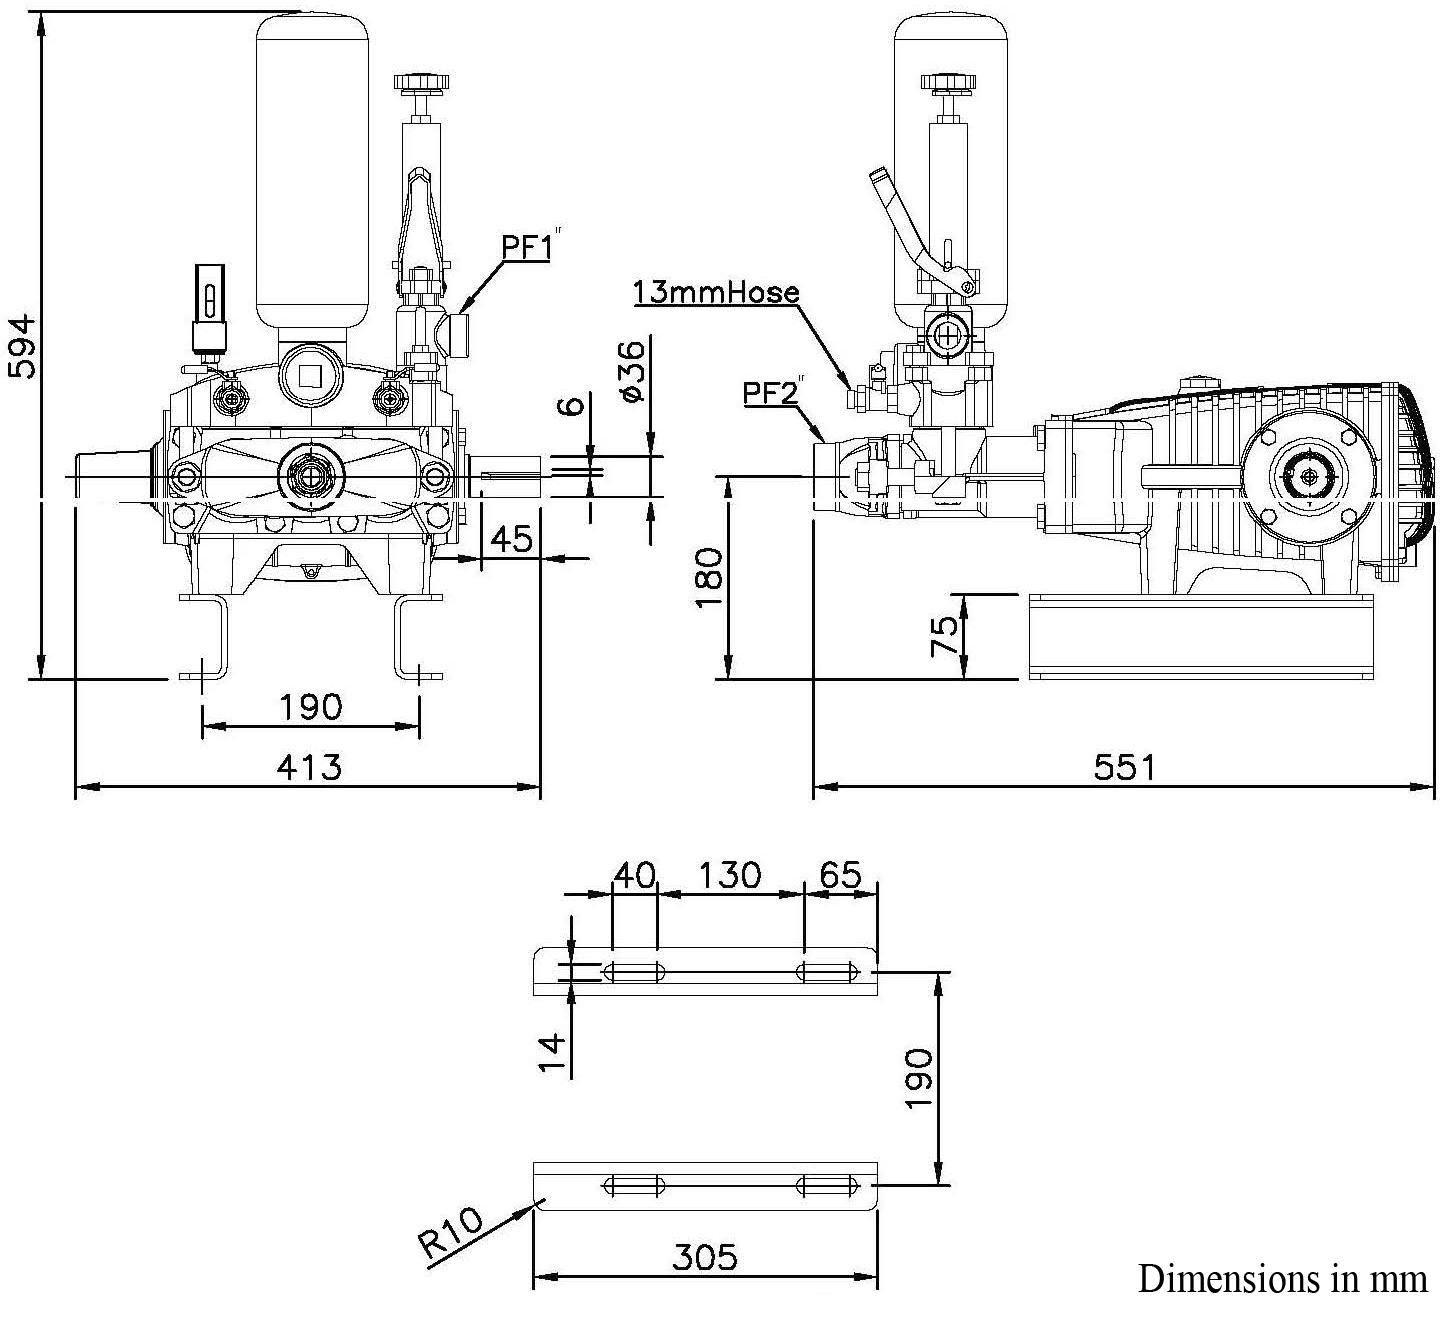 proimages/product/POWER_SPRAYER/dimensions/WL-5120.5120C兩用.jpg